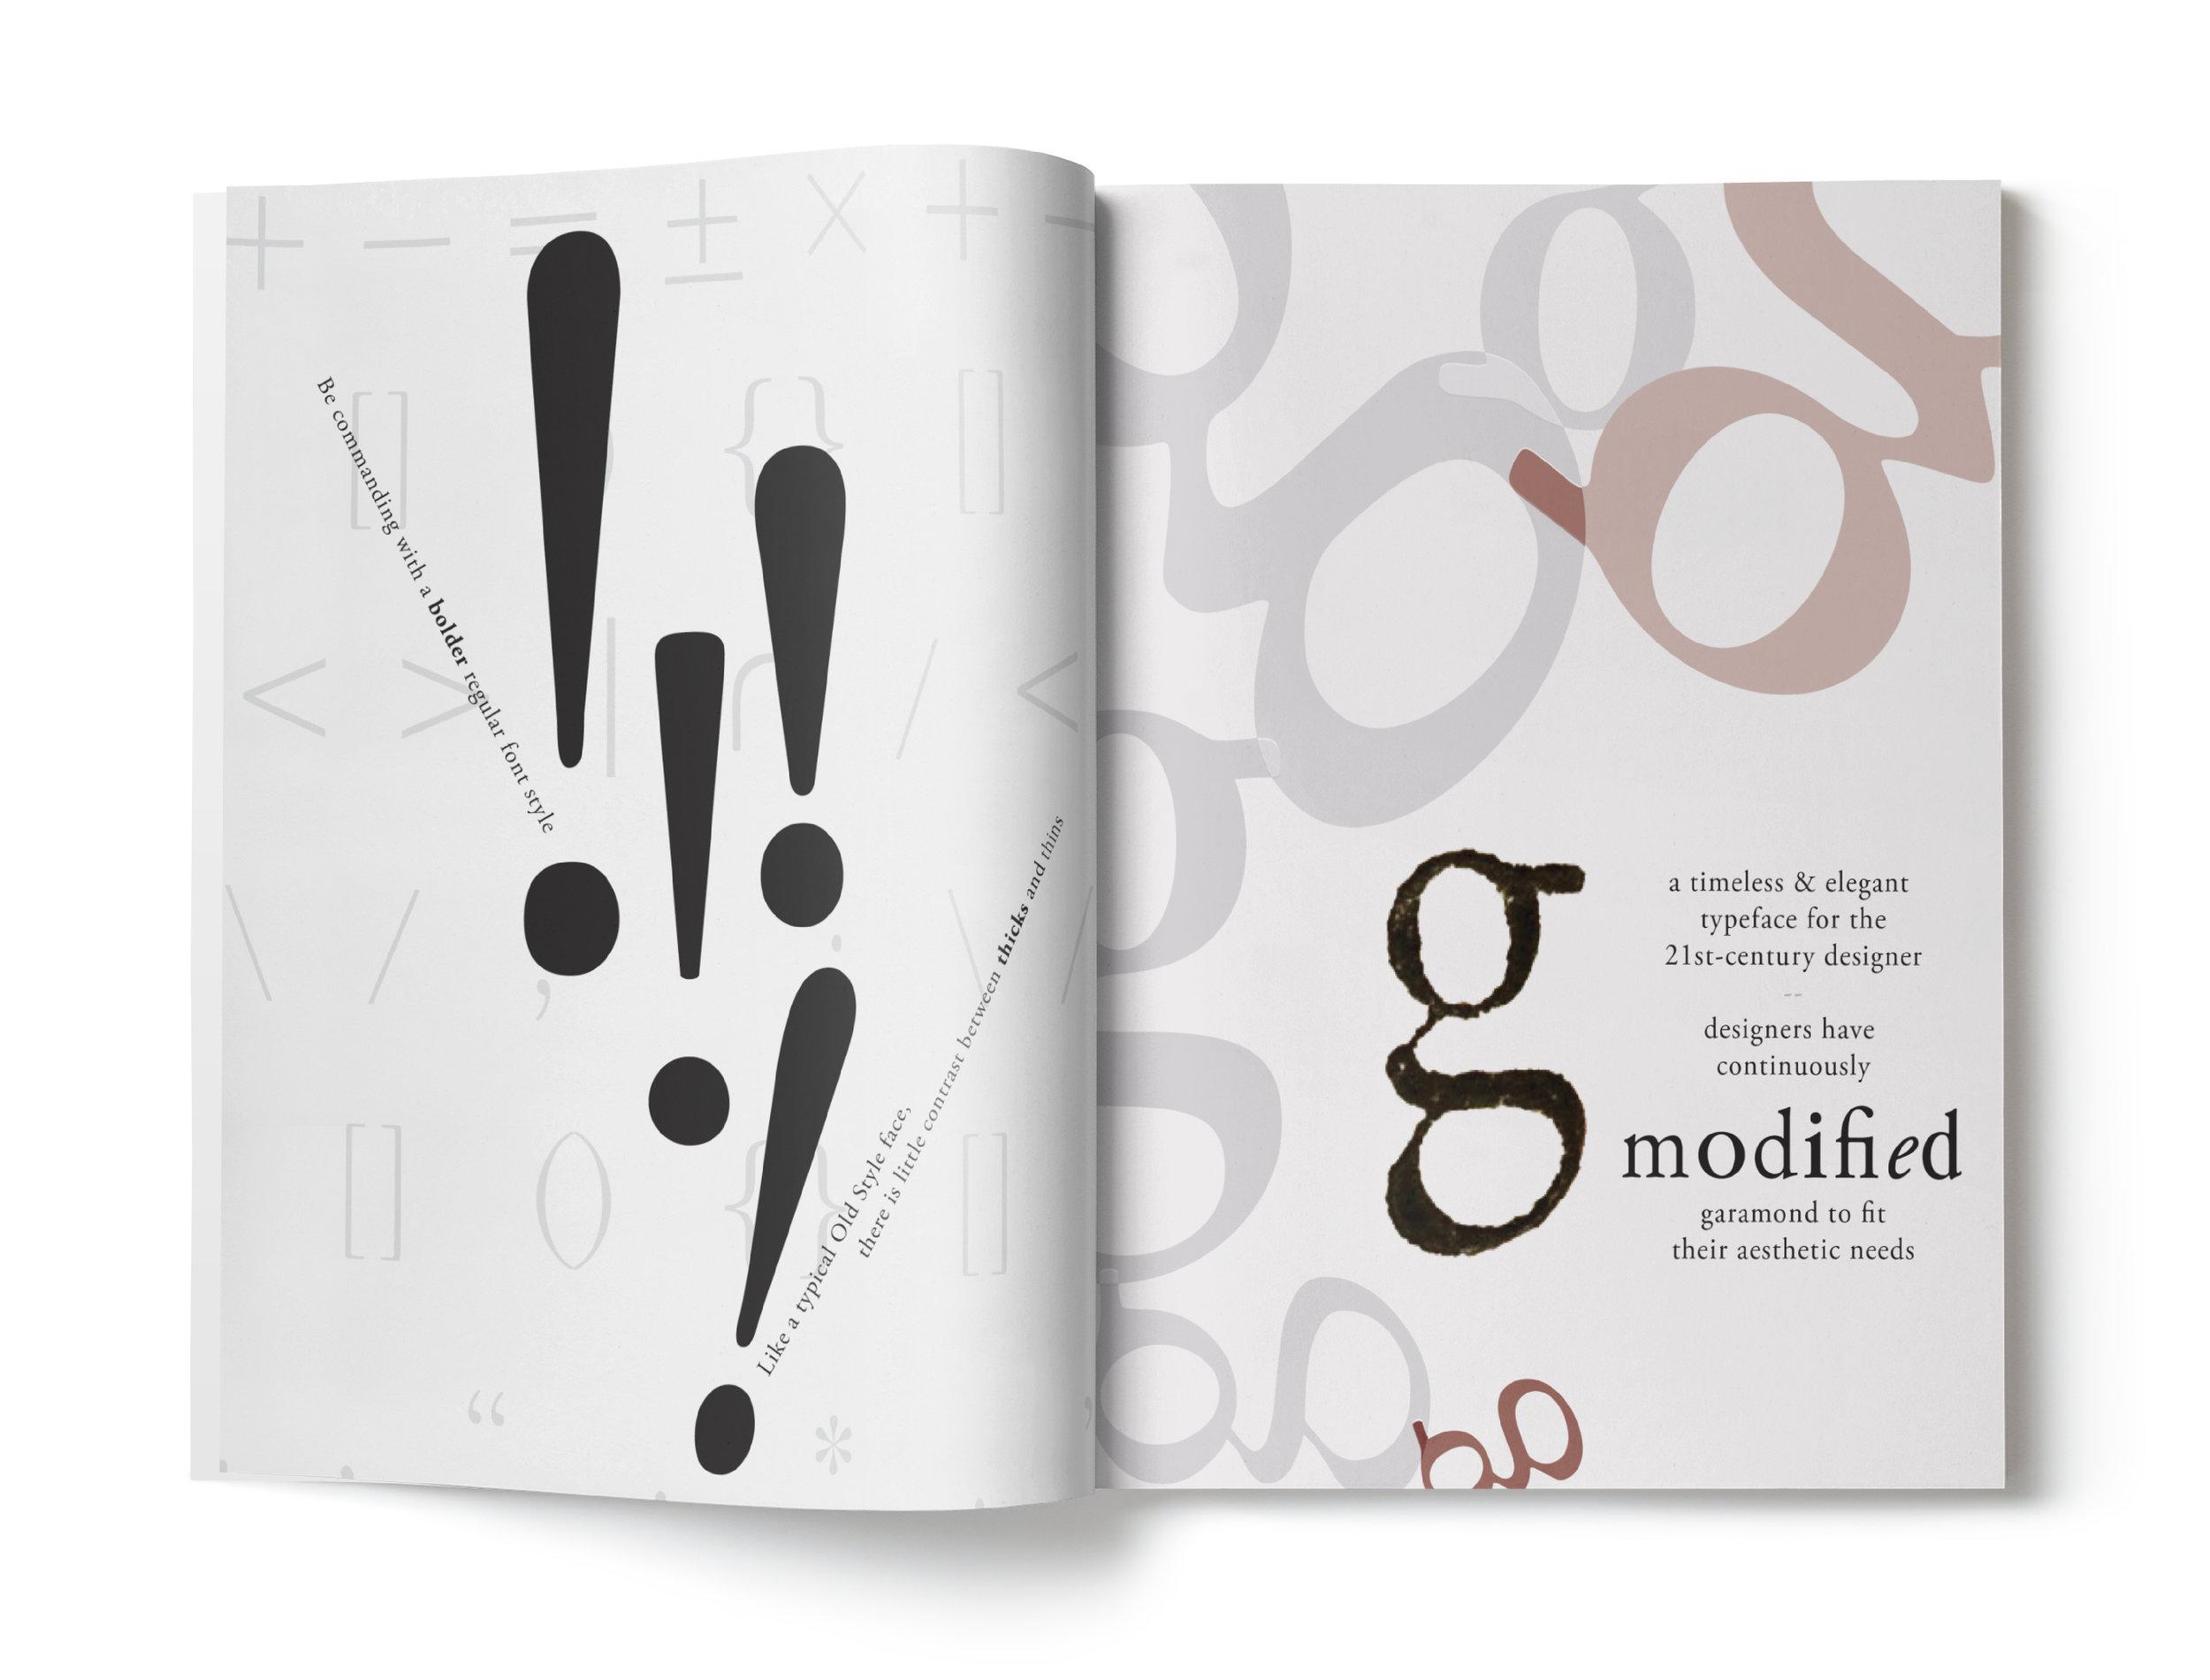 garamond pages-04.jpg